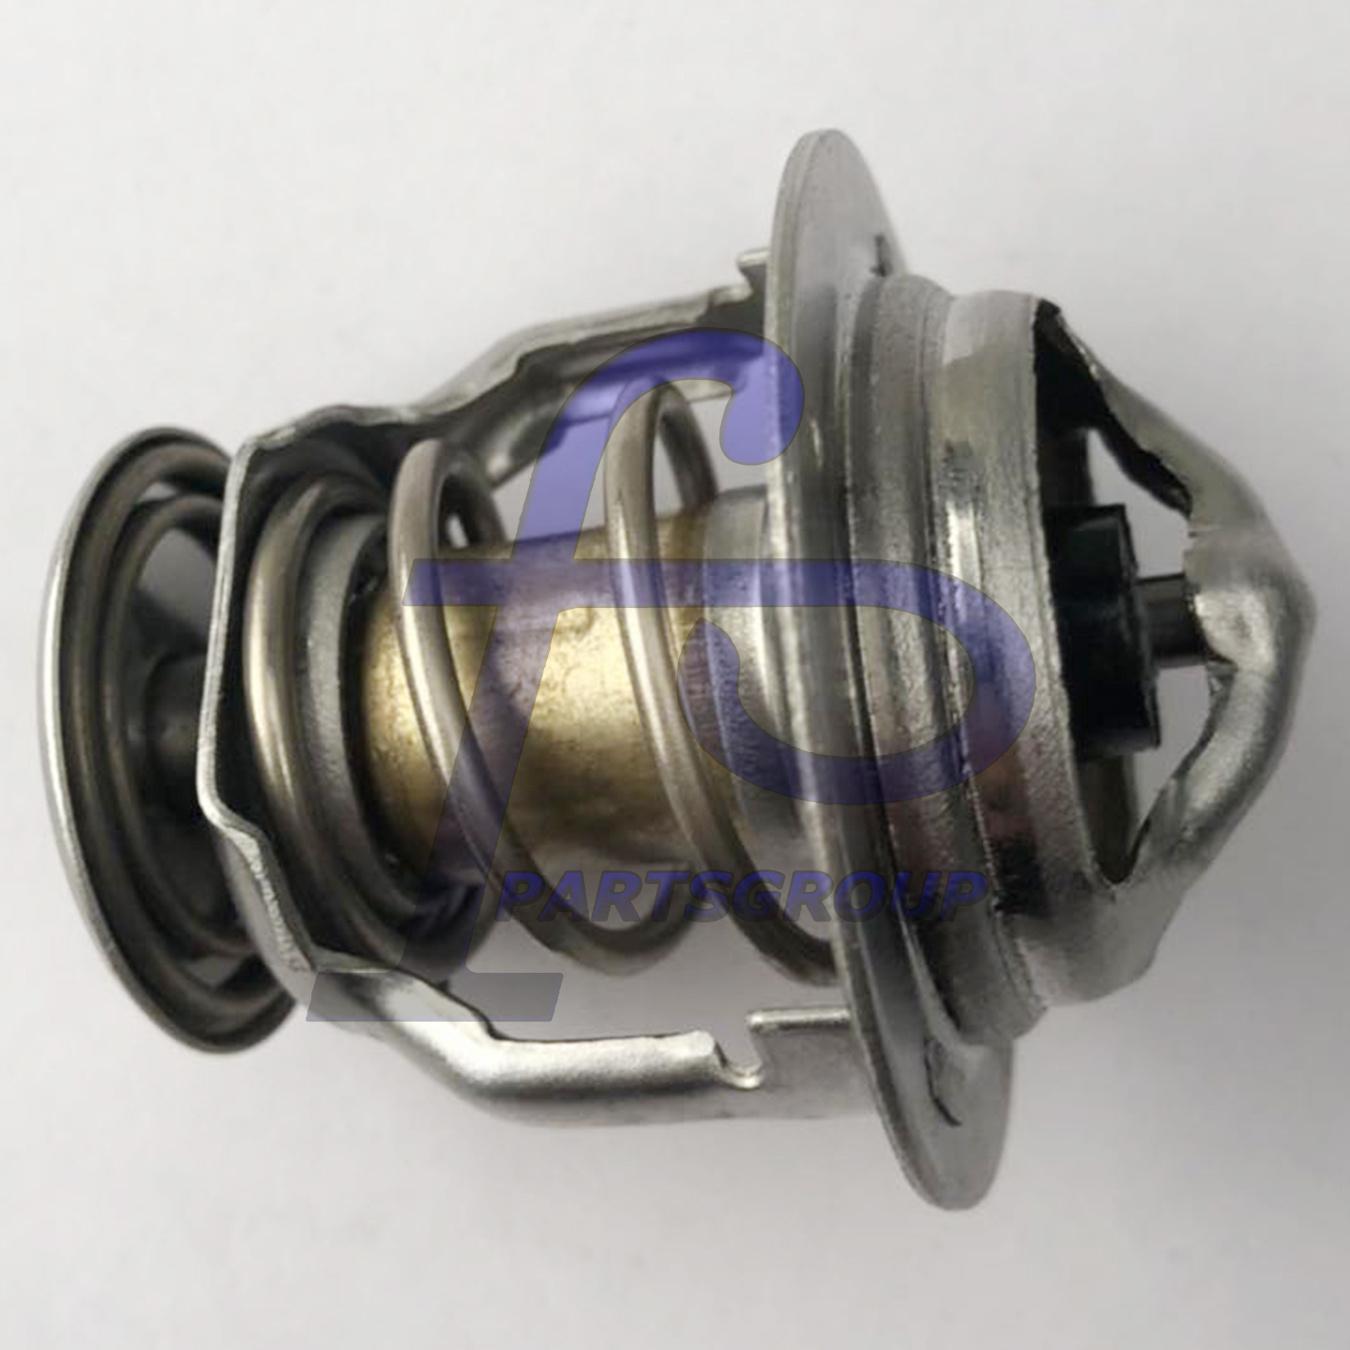 New Original Thermostat for Isuzu 3LD1 Engine